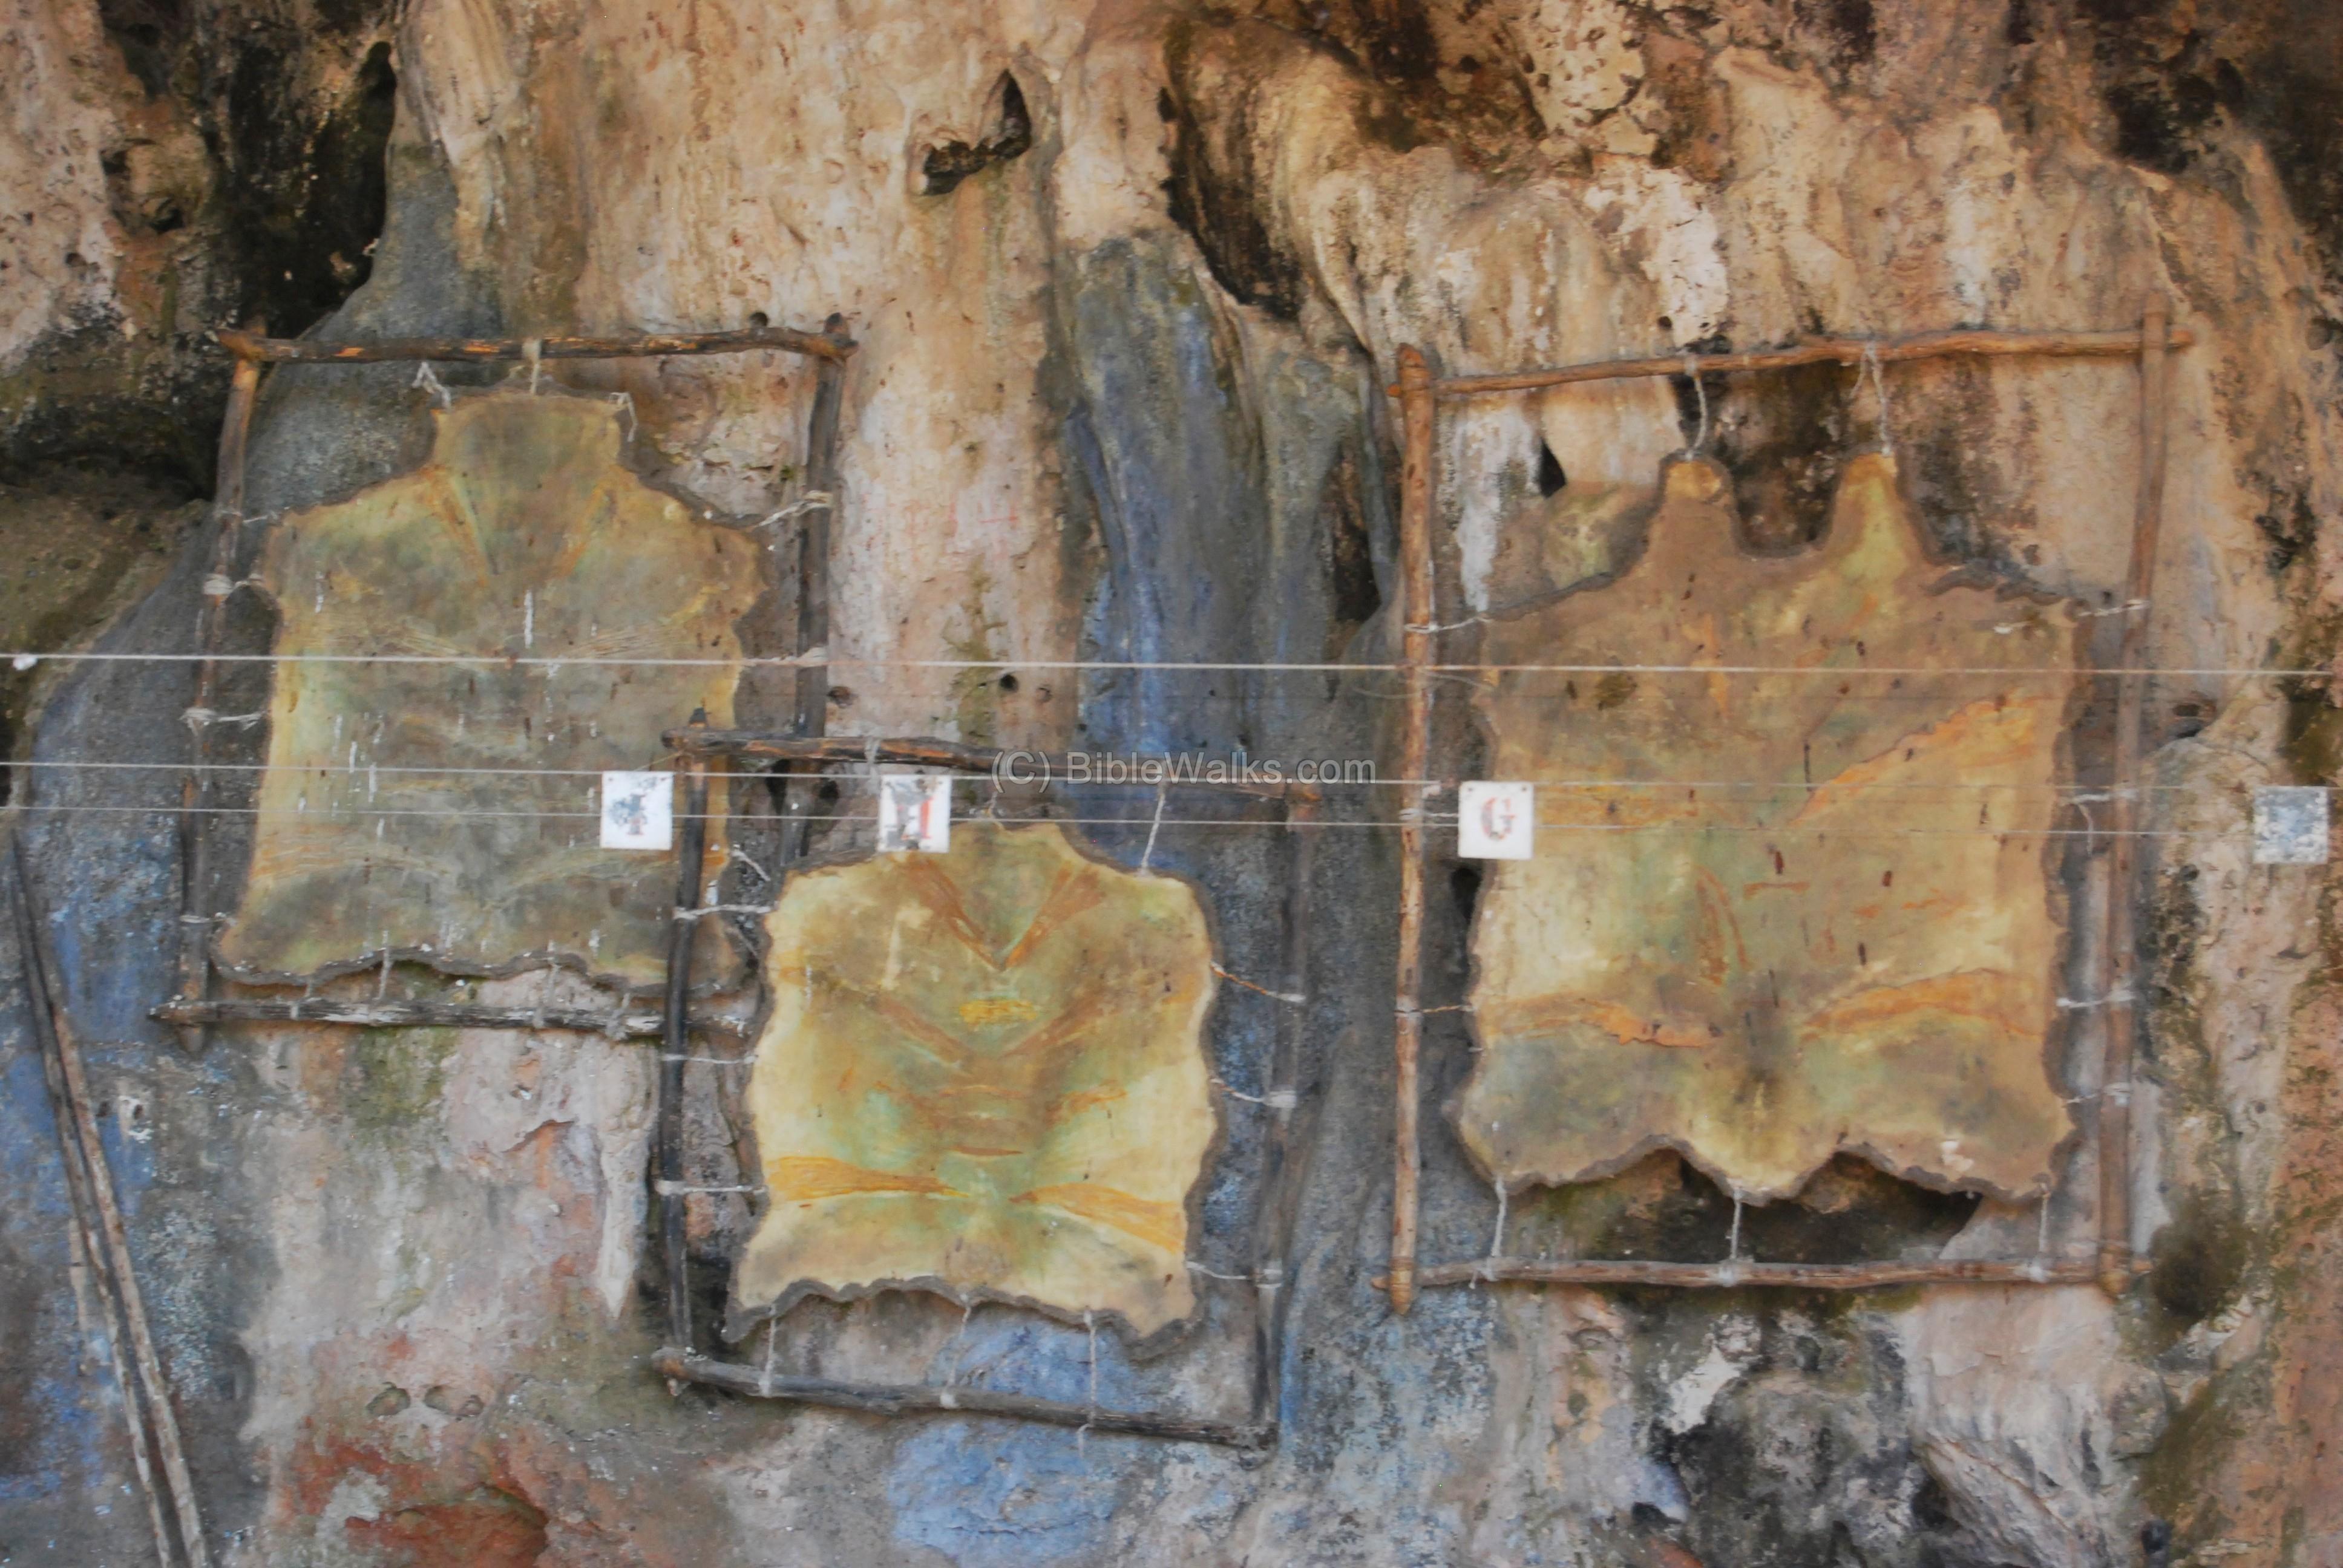 Carmel Caves Early Man Site